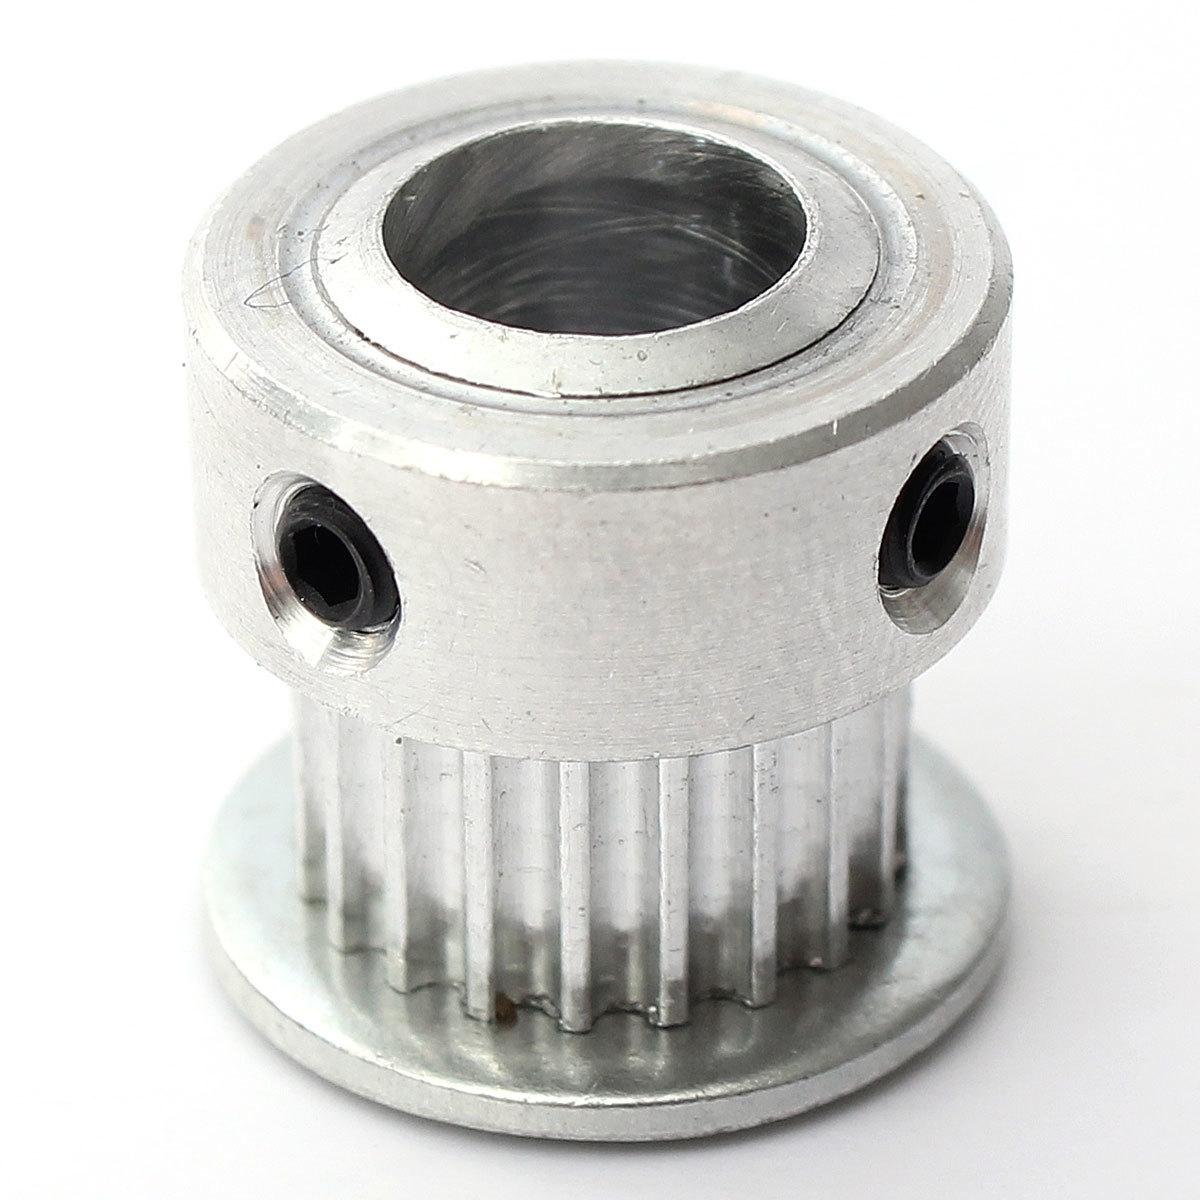 Buy Generic 3pcs 20t 8mm Bore 6mm Width Gt2 Aluminum Timing Drive Belt Pitch Diameter Image